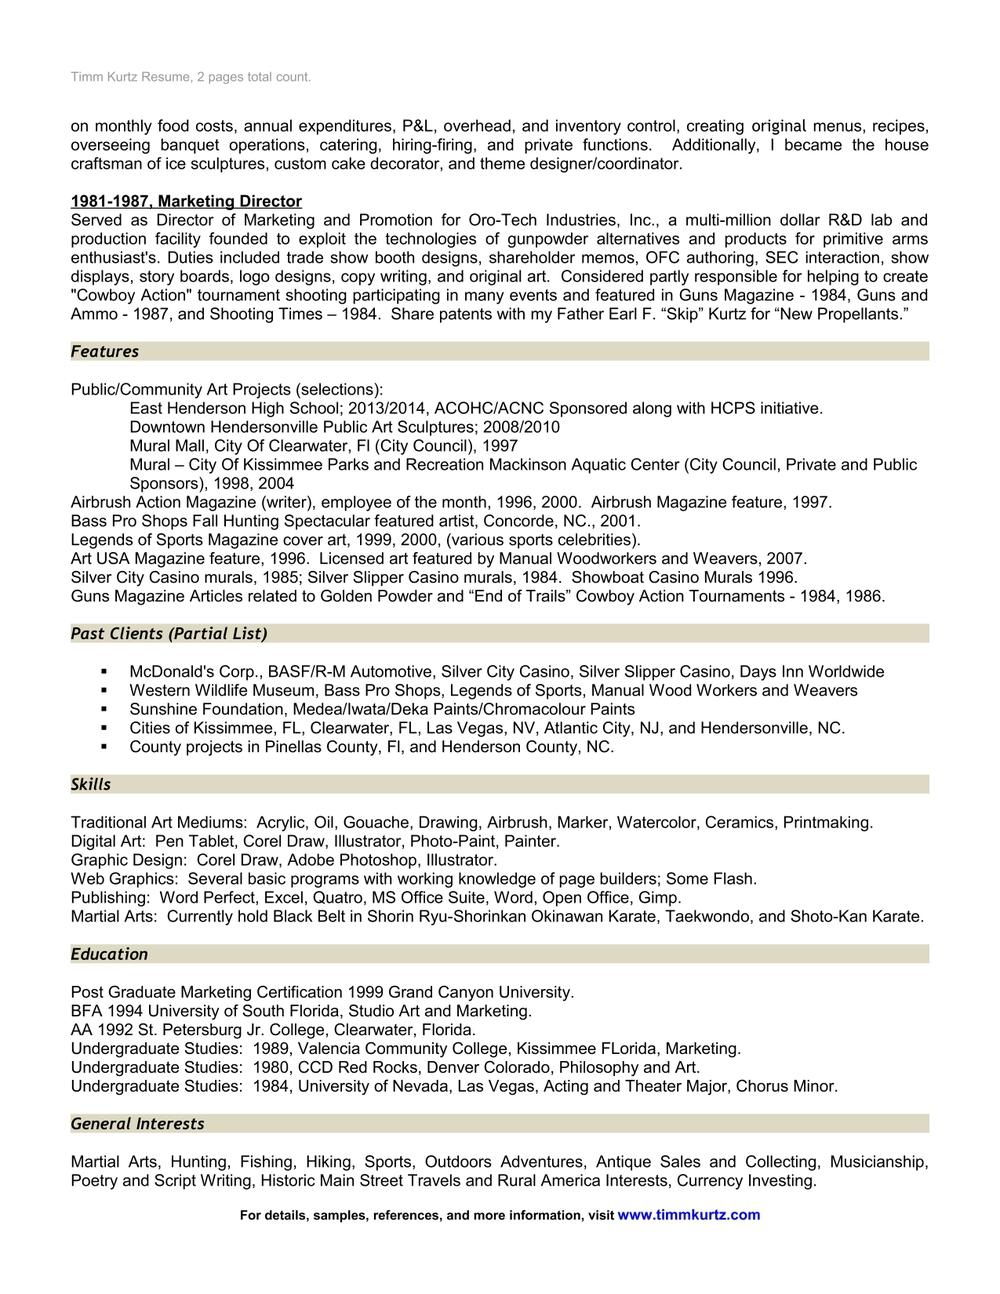 Past Clients and Resume Page of Timm Kurtz Artist. — Timm Kurtz Art